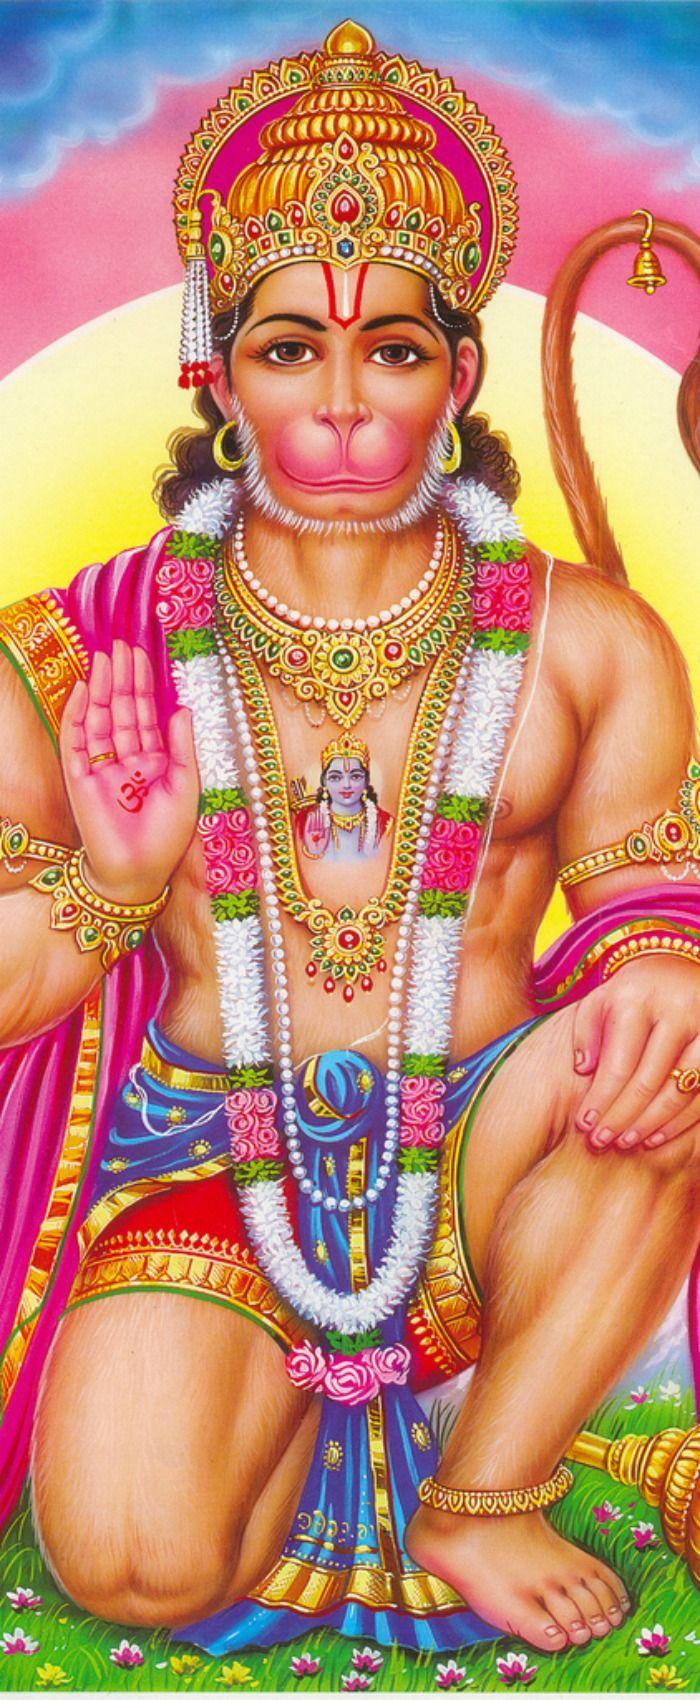 Hanuman Chalisa Lyrics and Translation in English